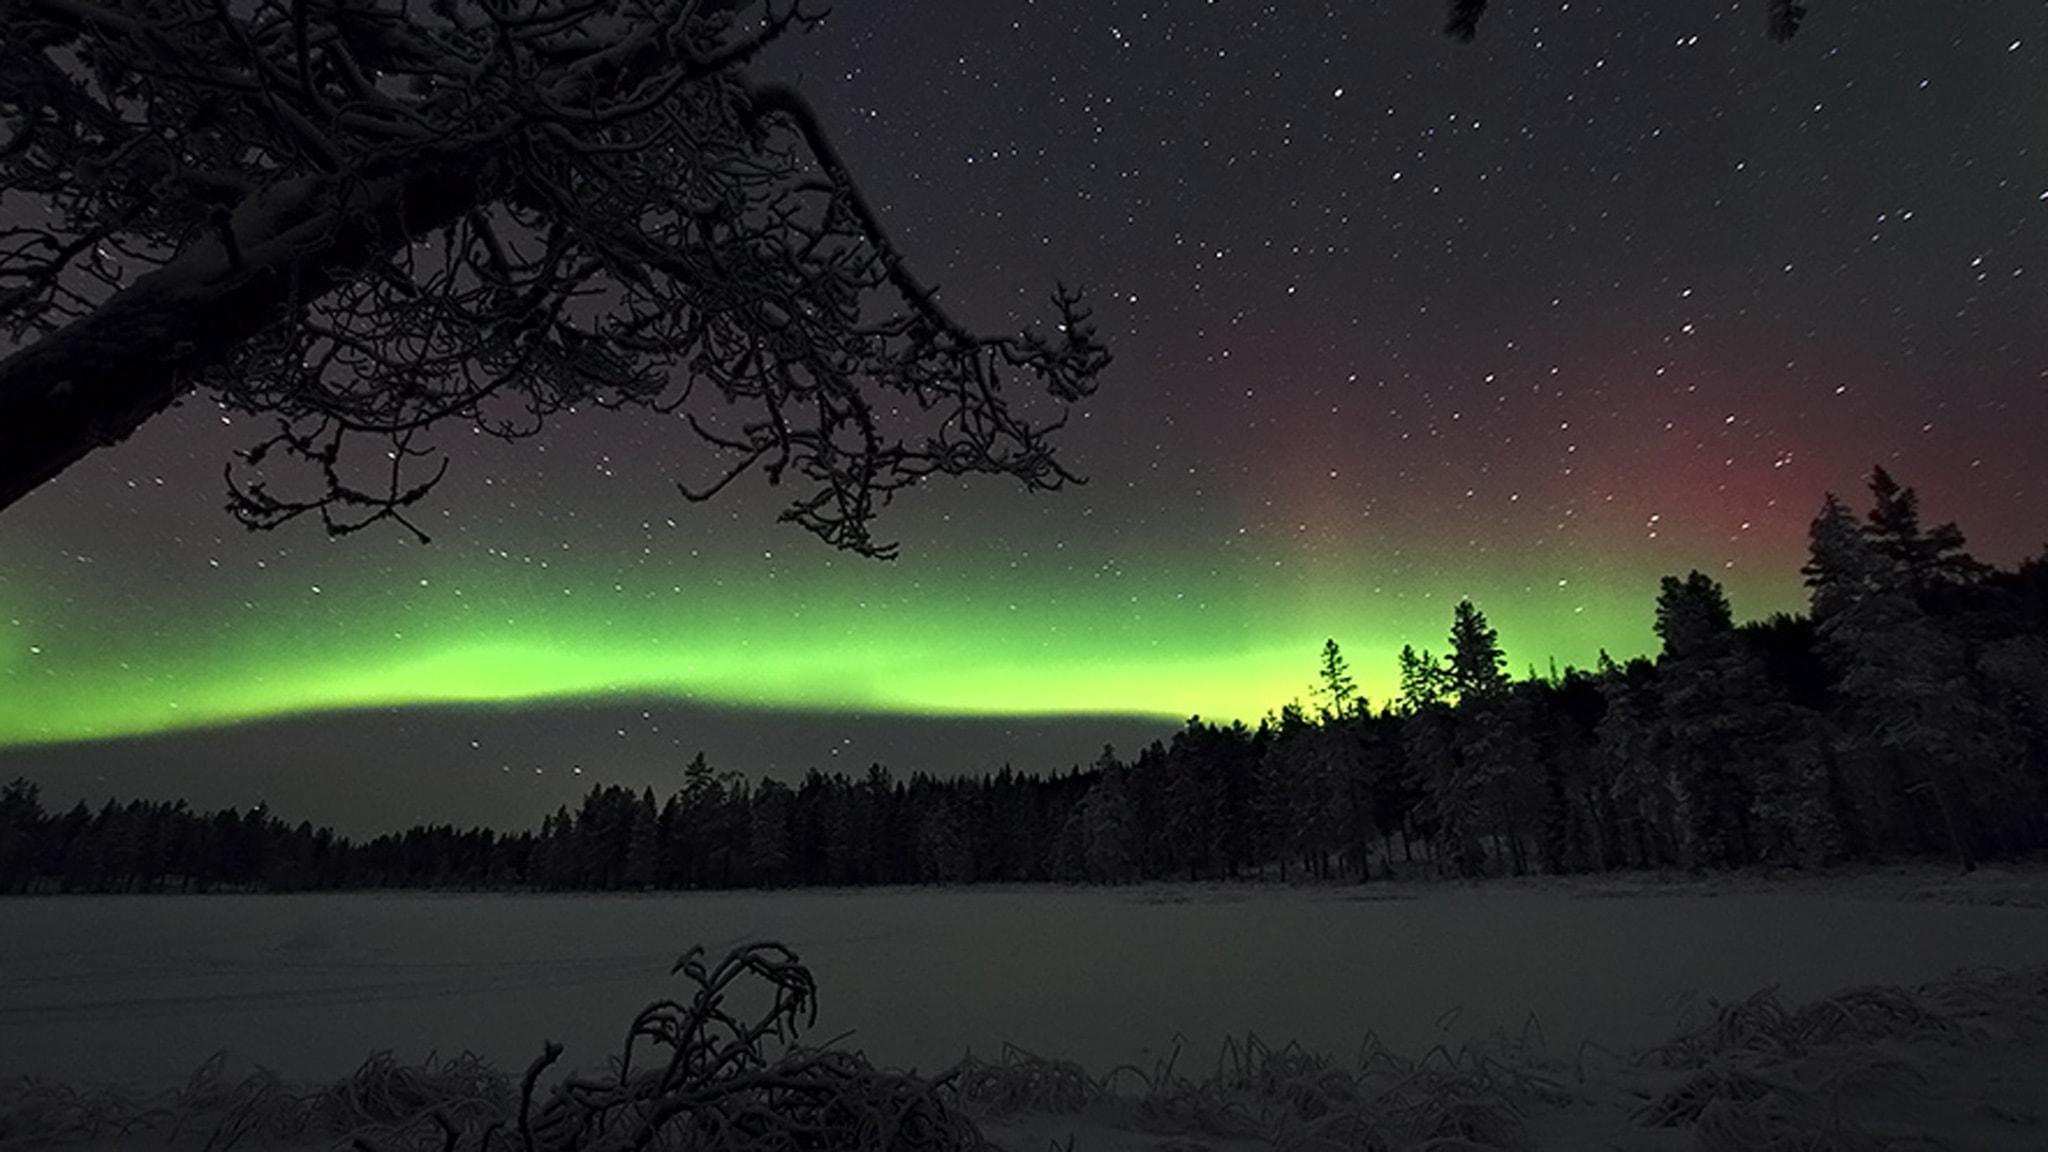 Veckans bild  Mera norrsken - Veckans bild i P4 Norrbotten - P4 Norrbotten   9fa2919d129ad